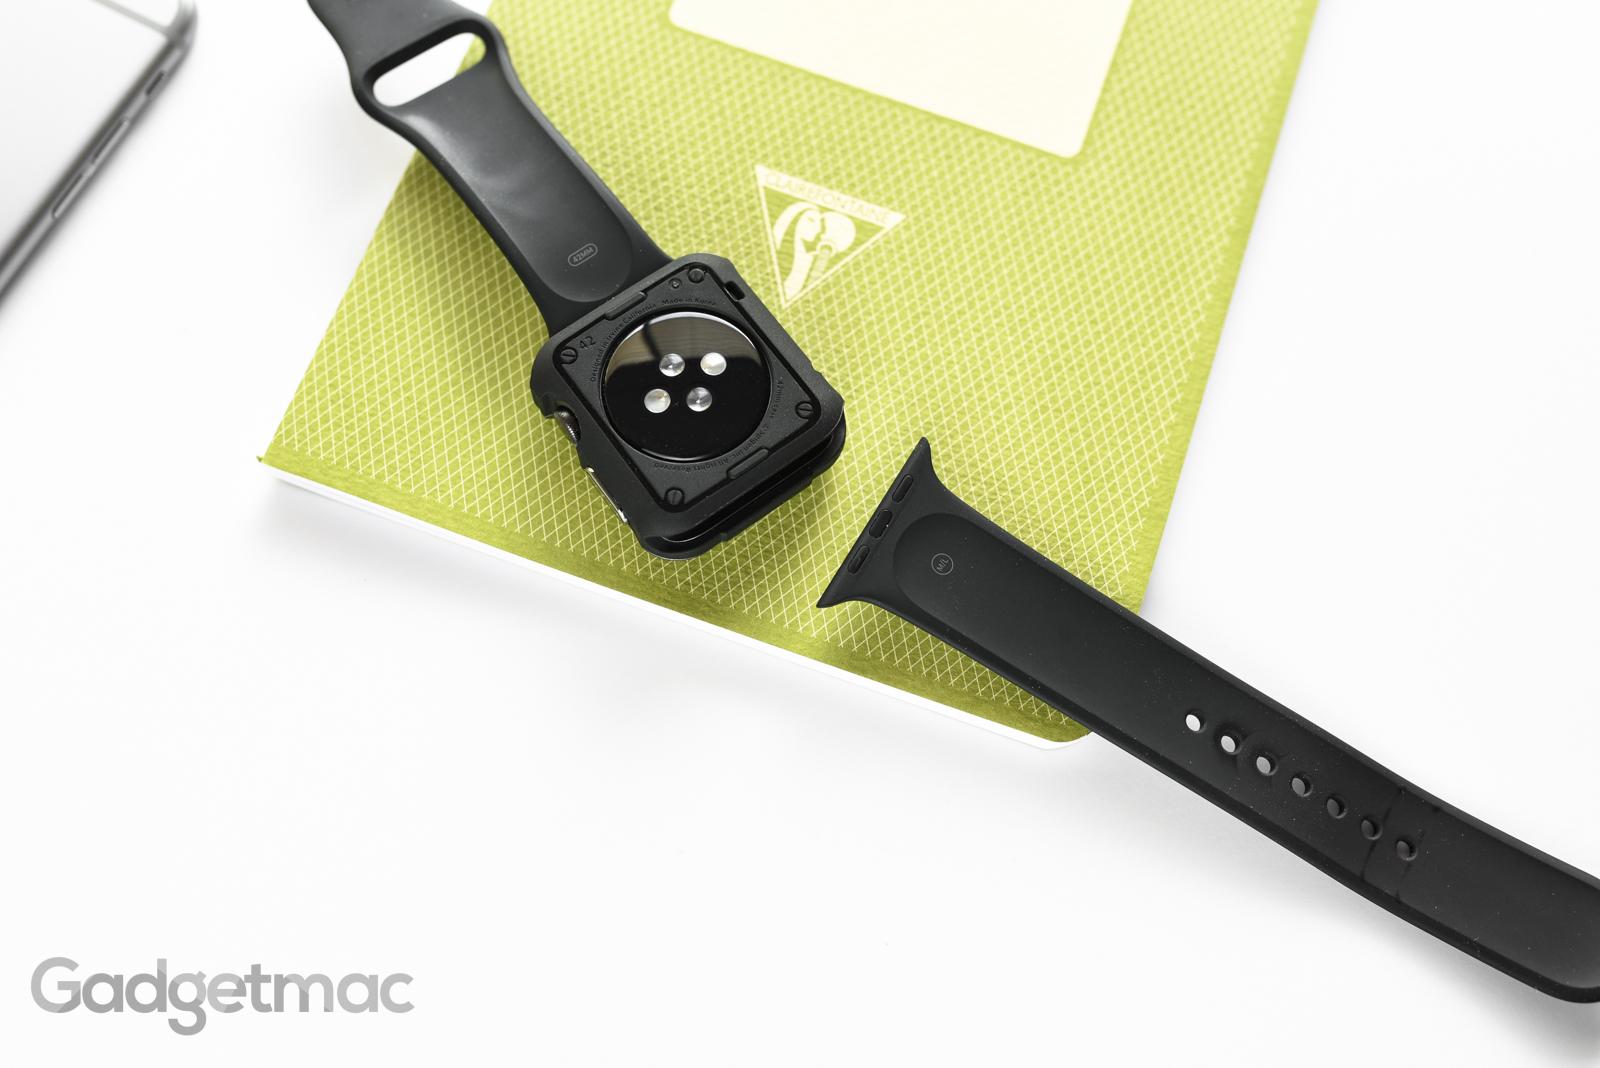 spigen-apple-watch-tough-armor-case-with-built-in-screen-protector-back.jpg